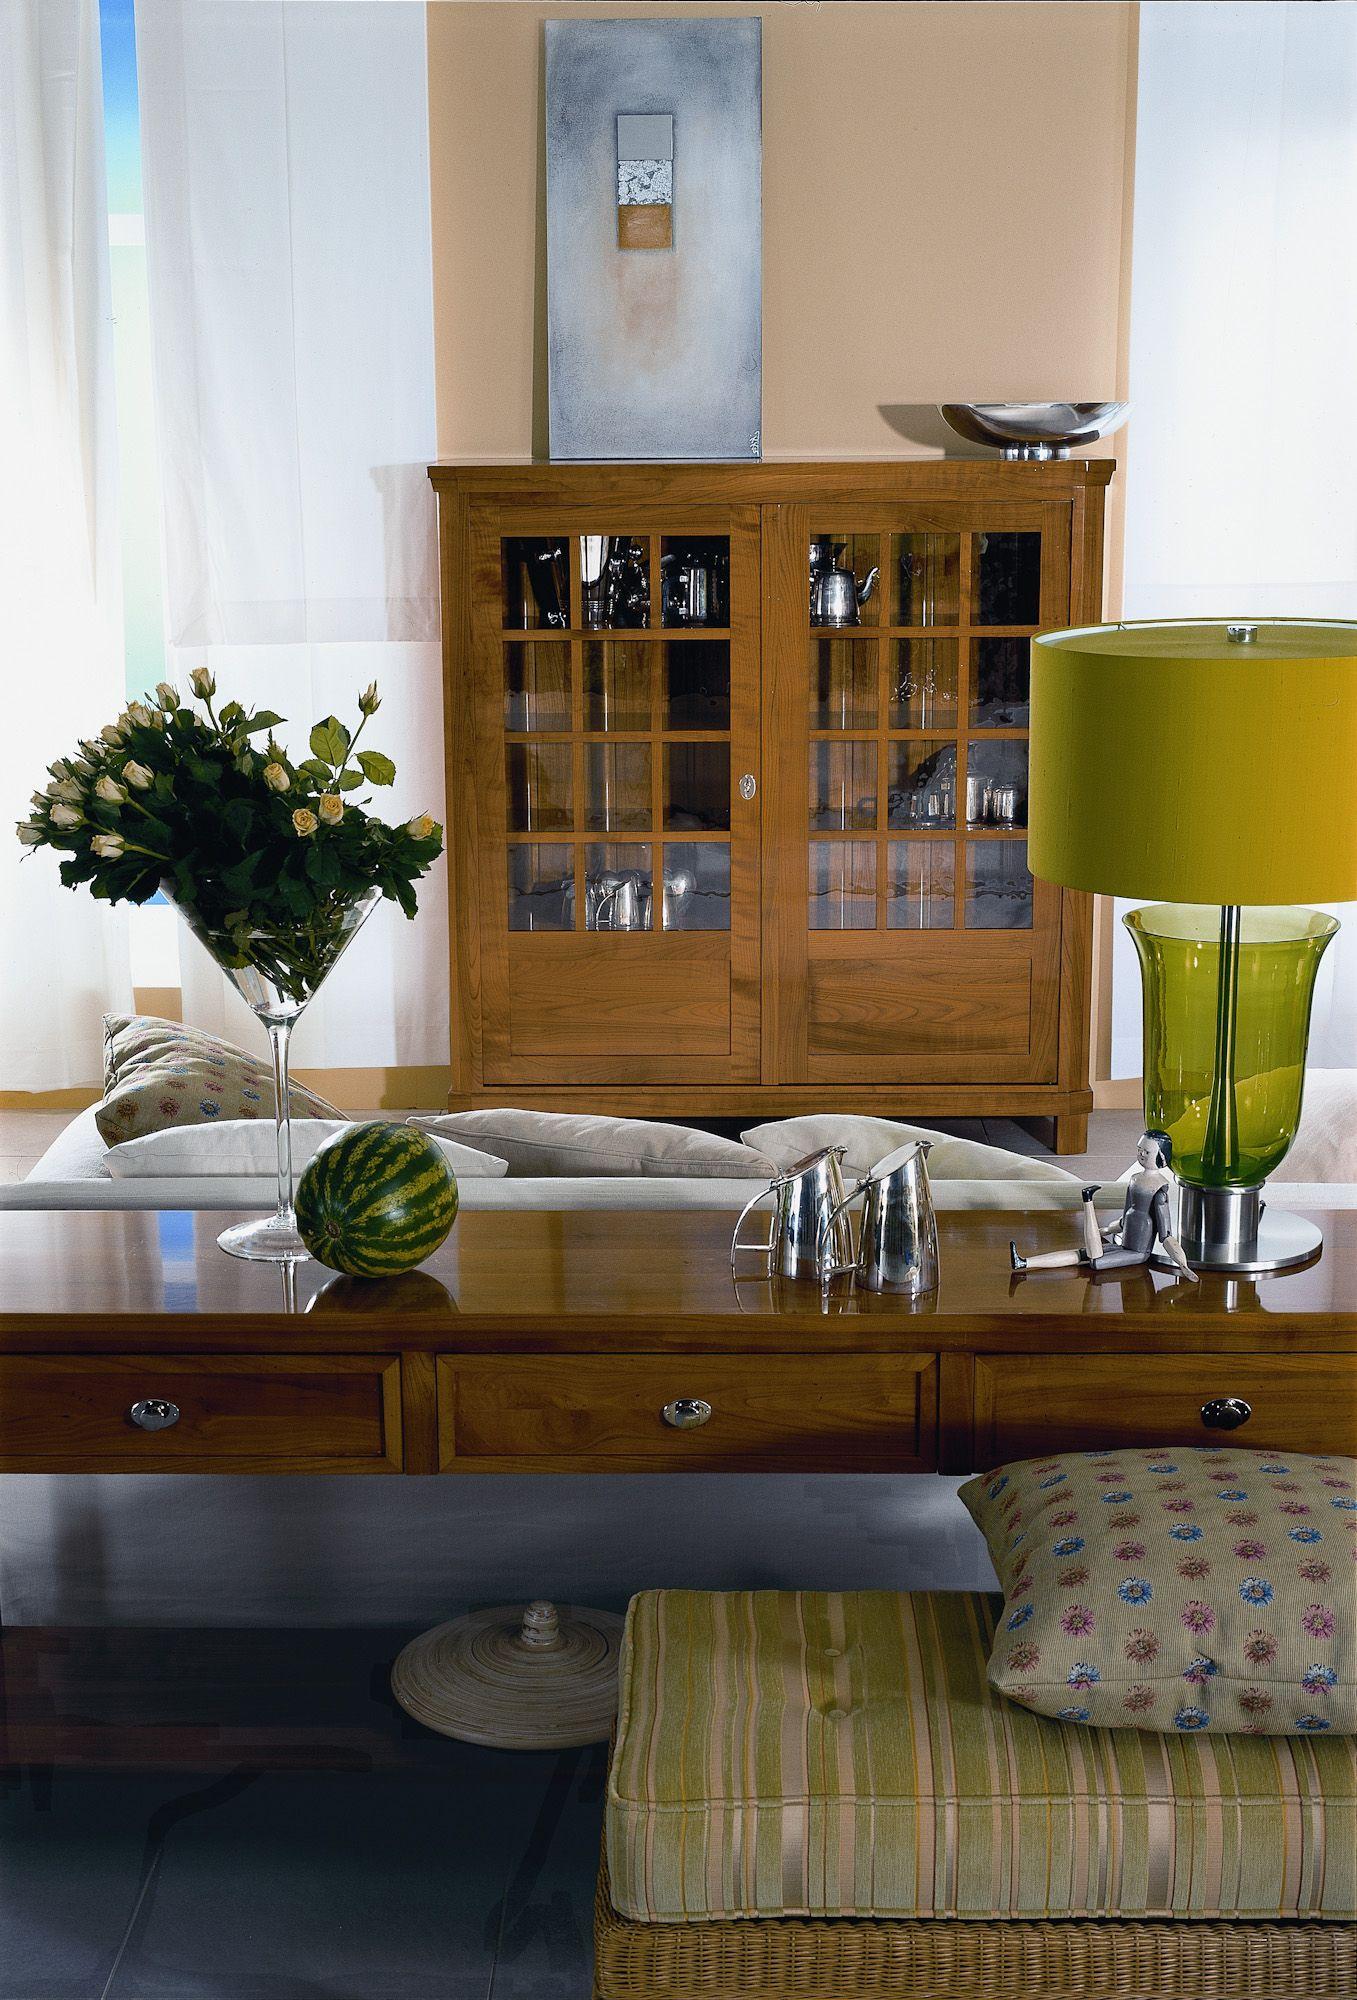 Solitärschrank | Eiche Massiv | Holz | Antike Optik   Bei Möbel Morschett